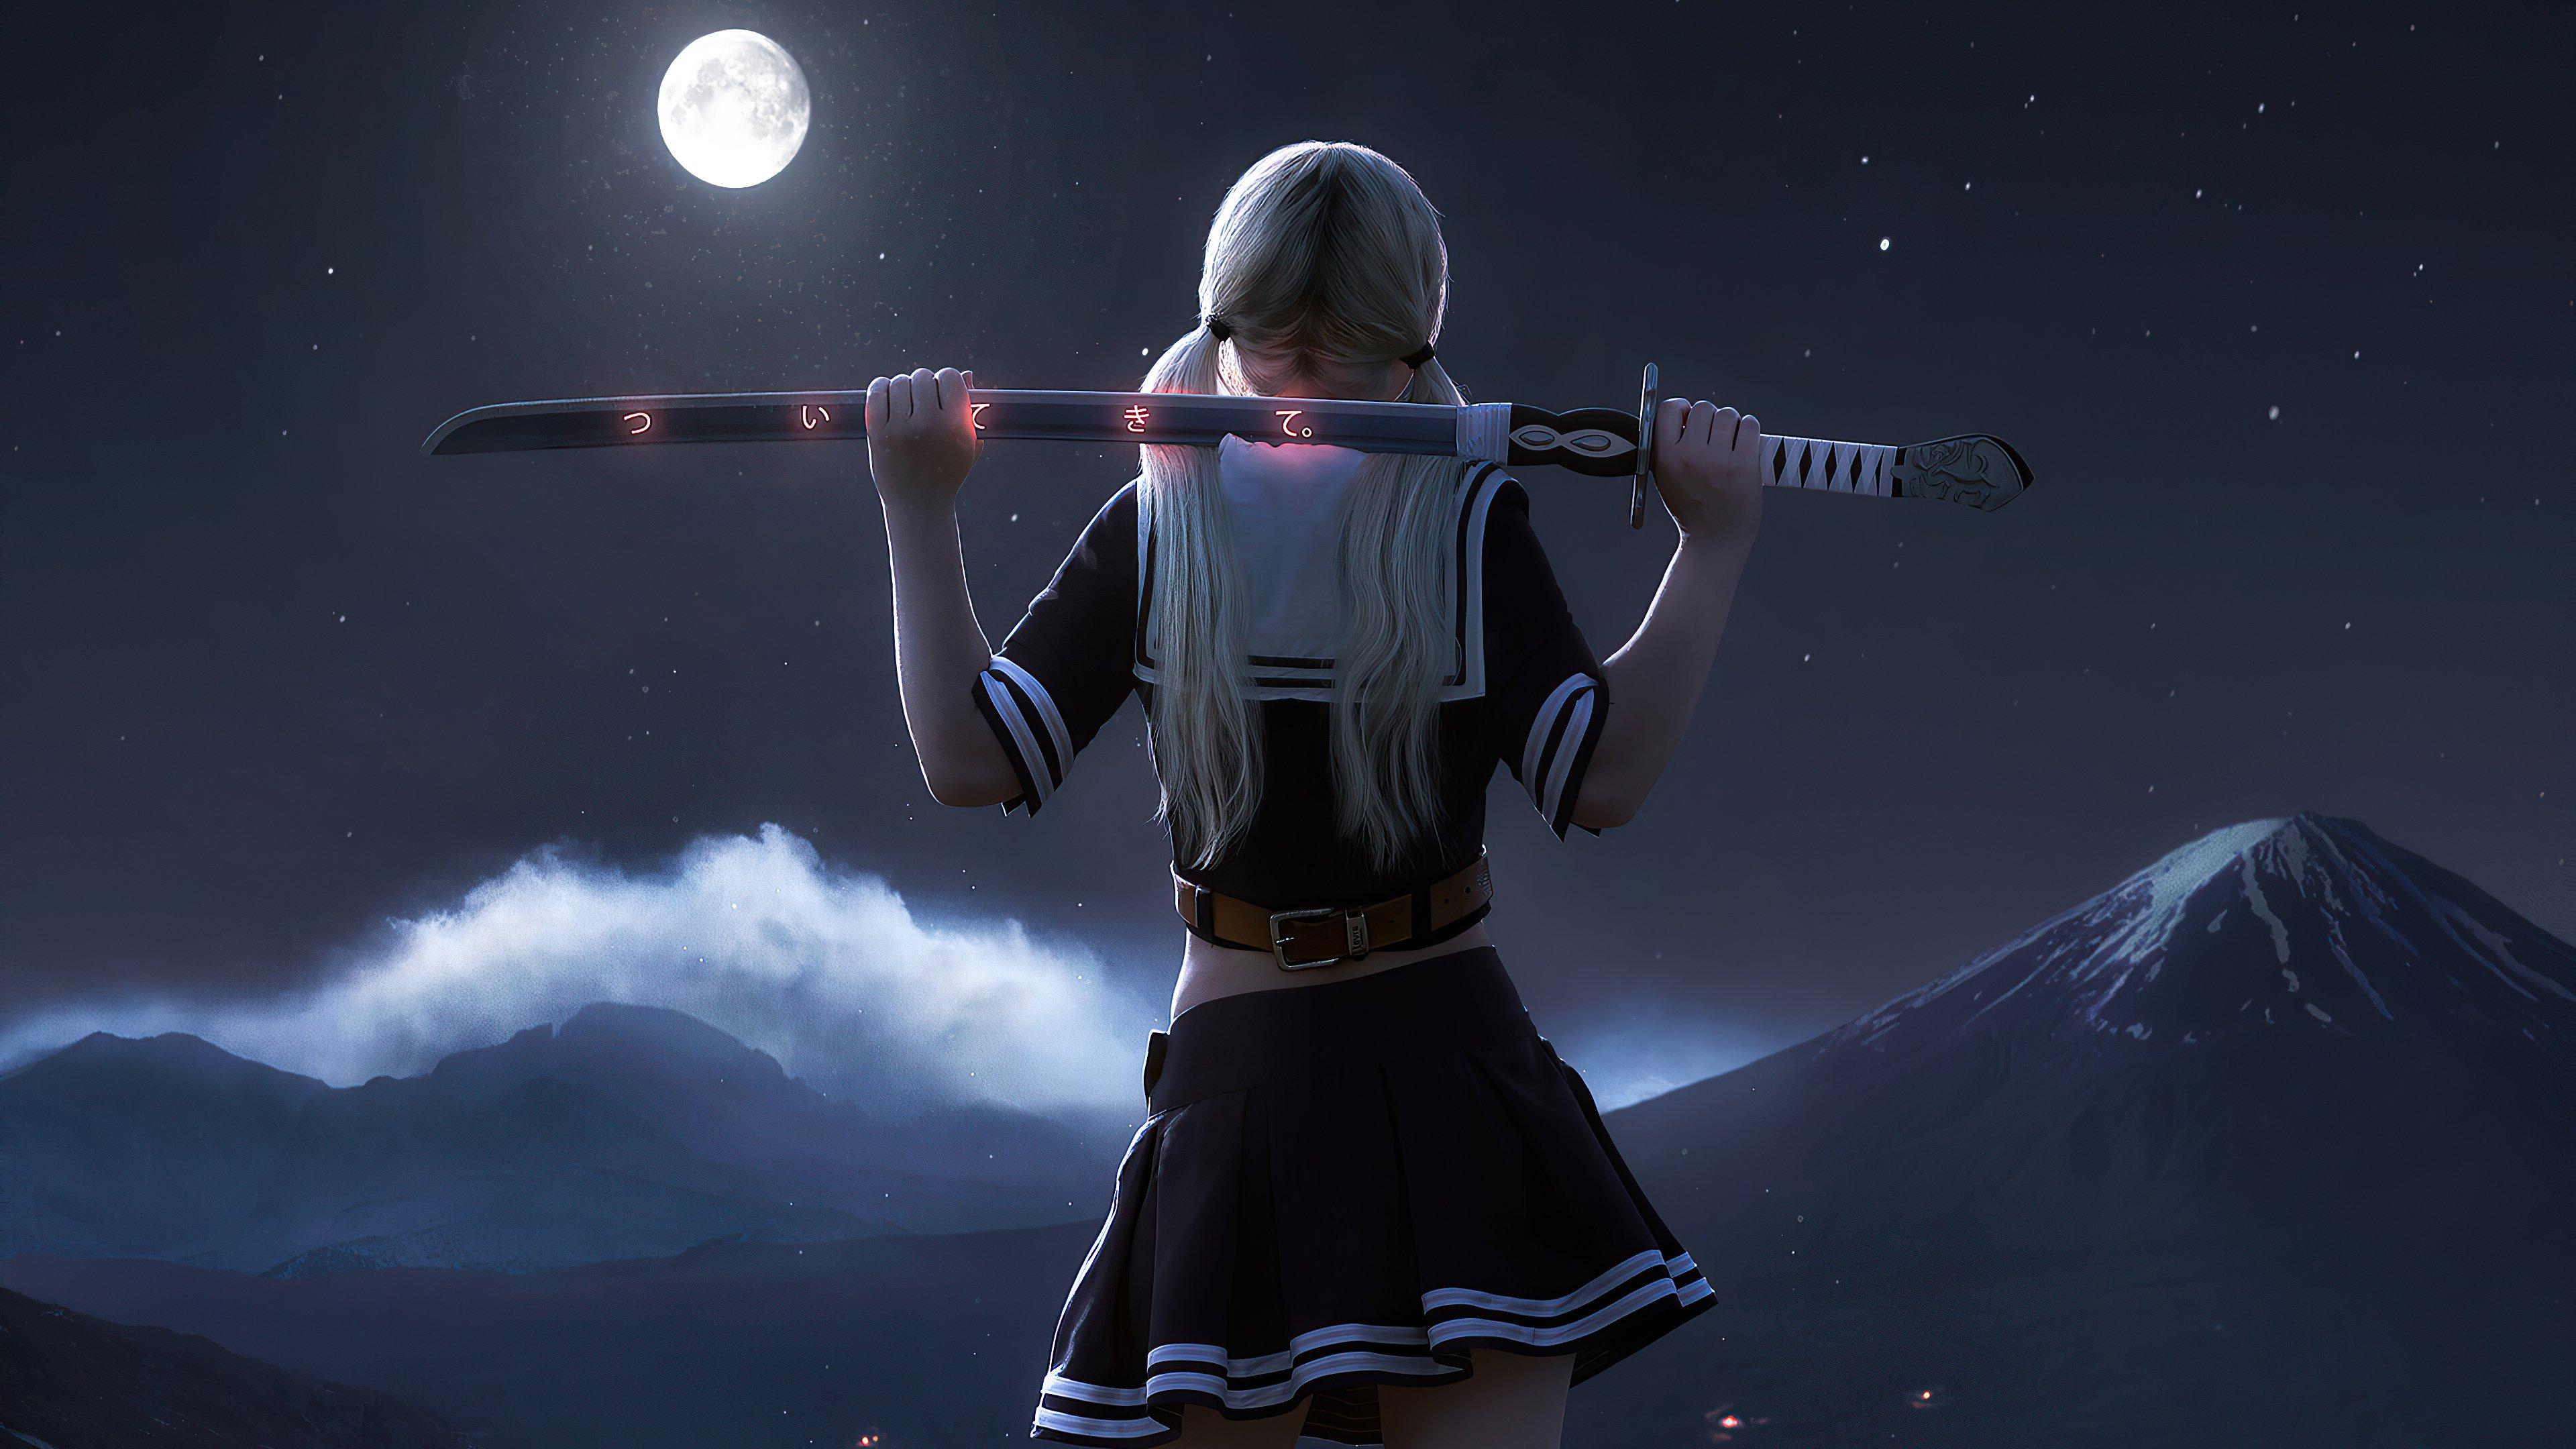 Fondos de pantalla Anime Chica con katana a la luz de la luna